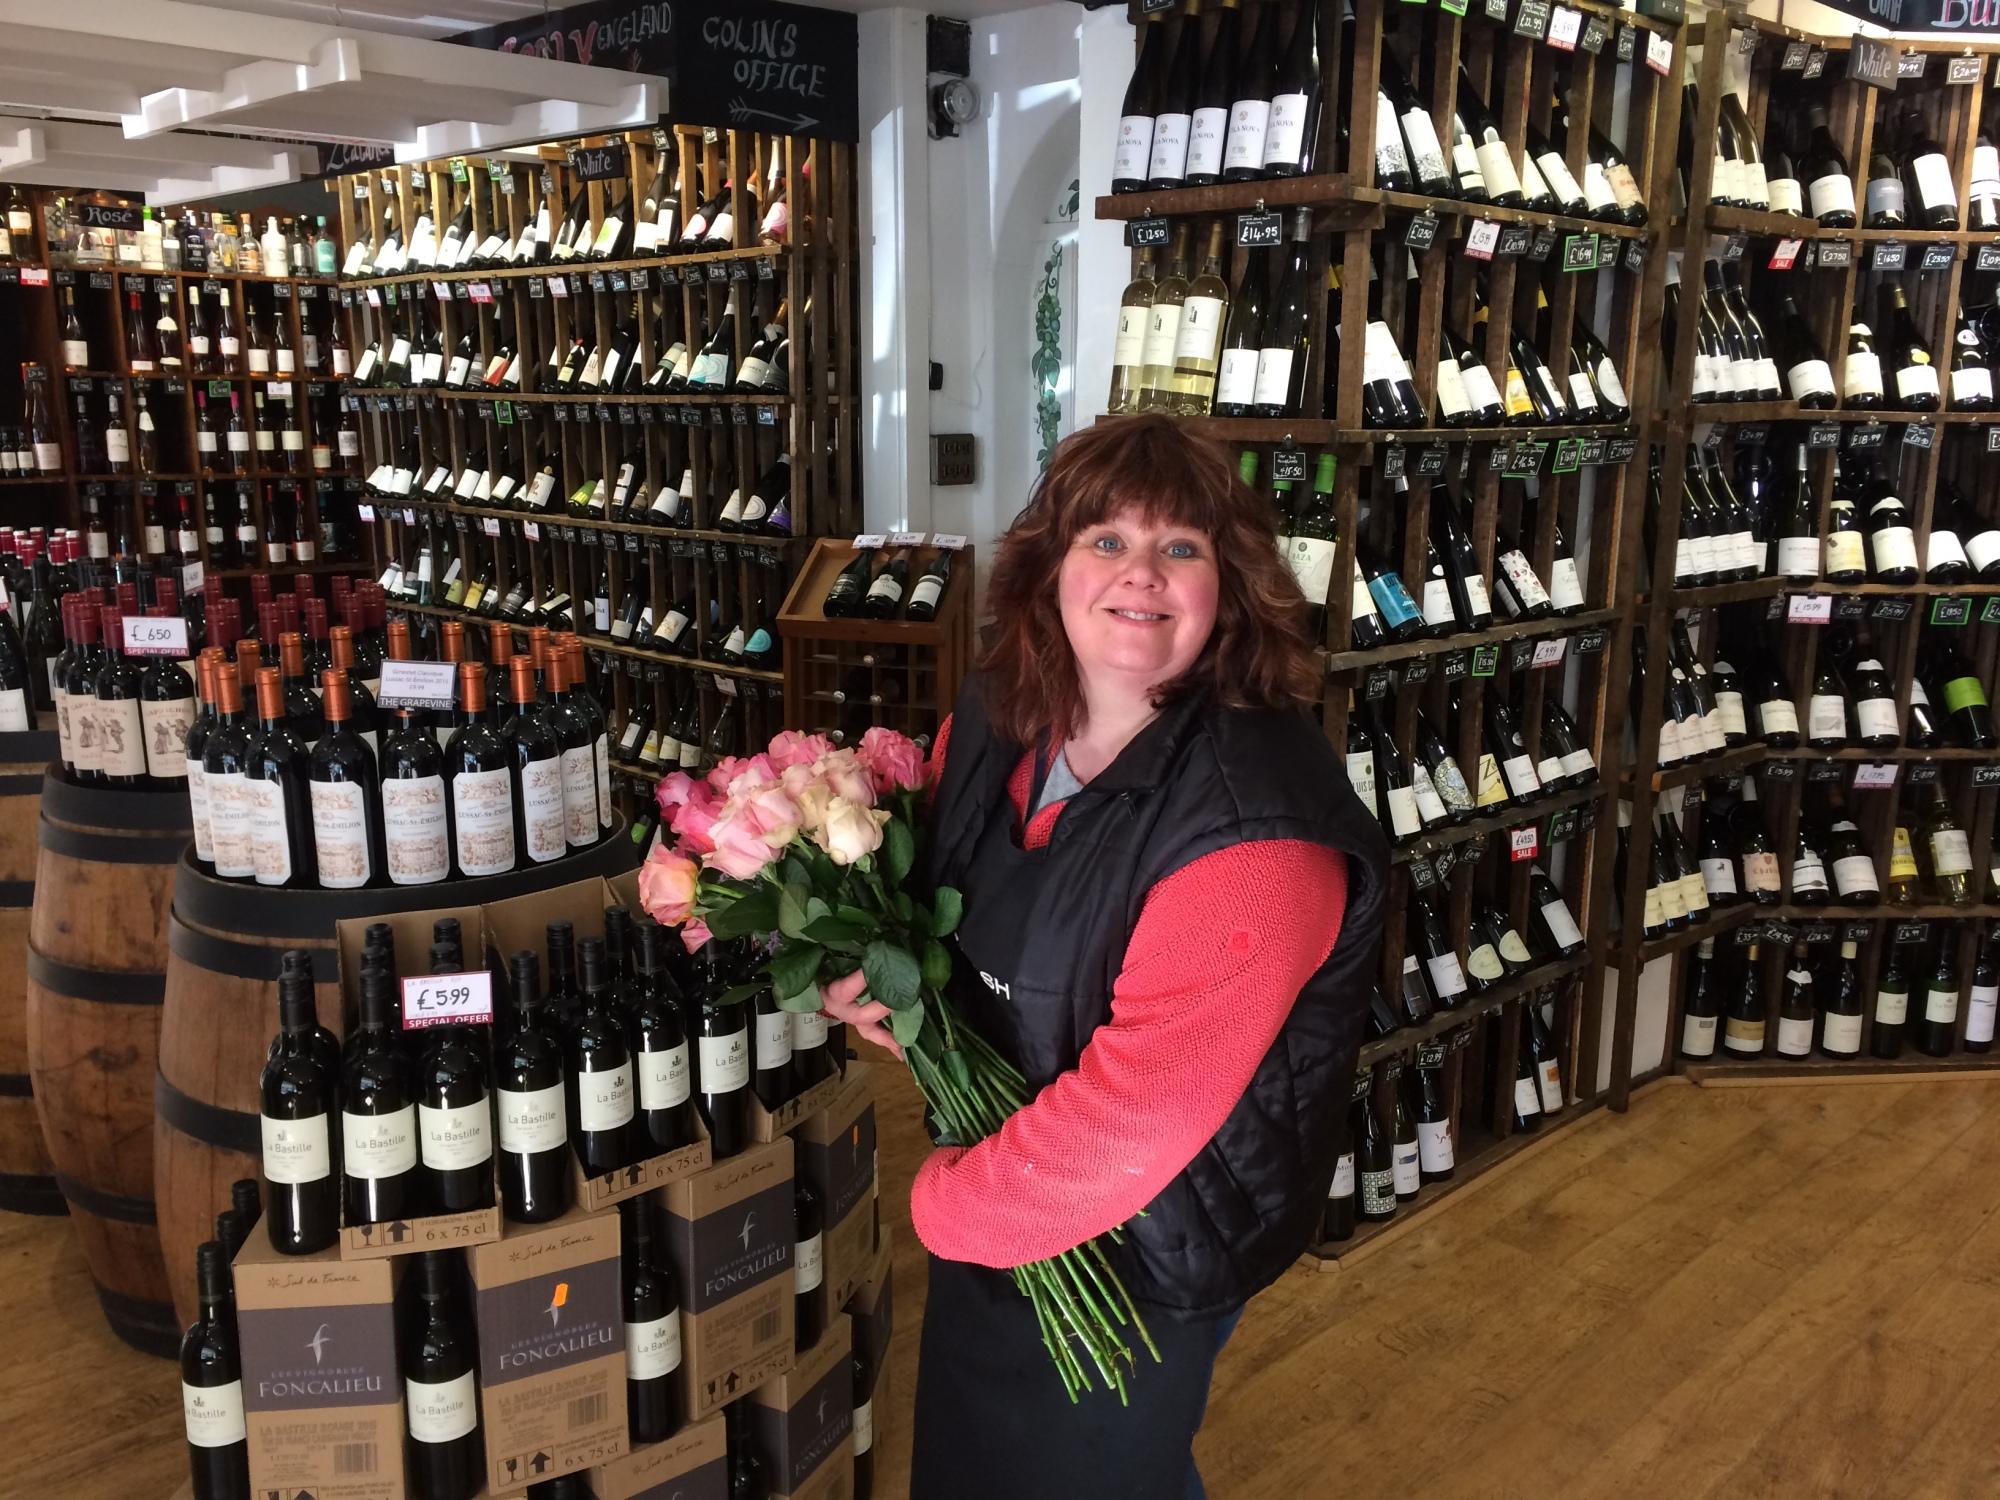 Florist, flowers, wine merchant